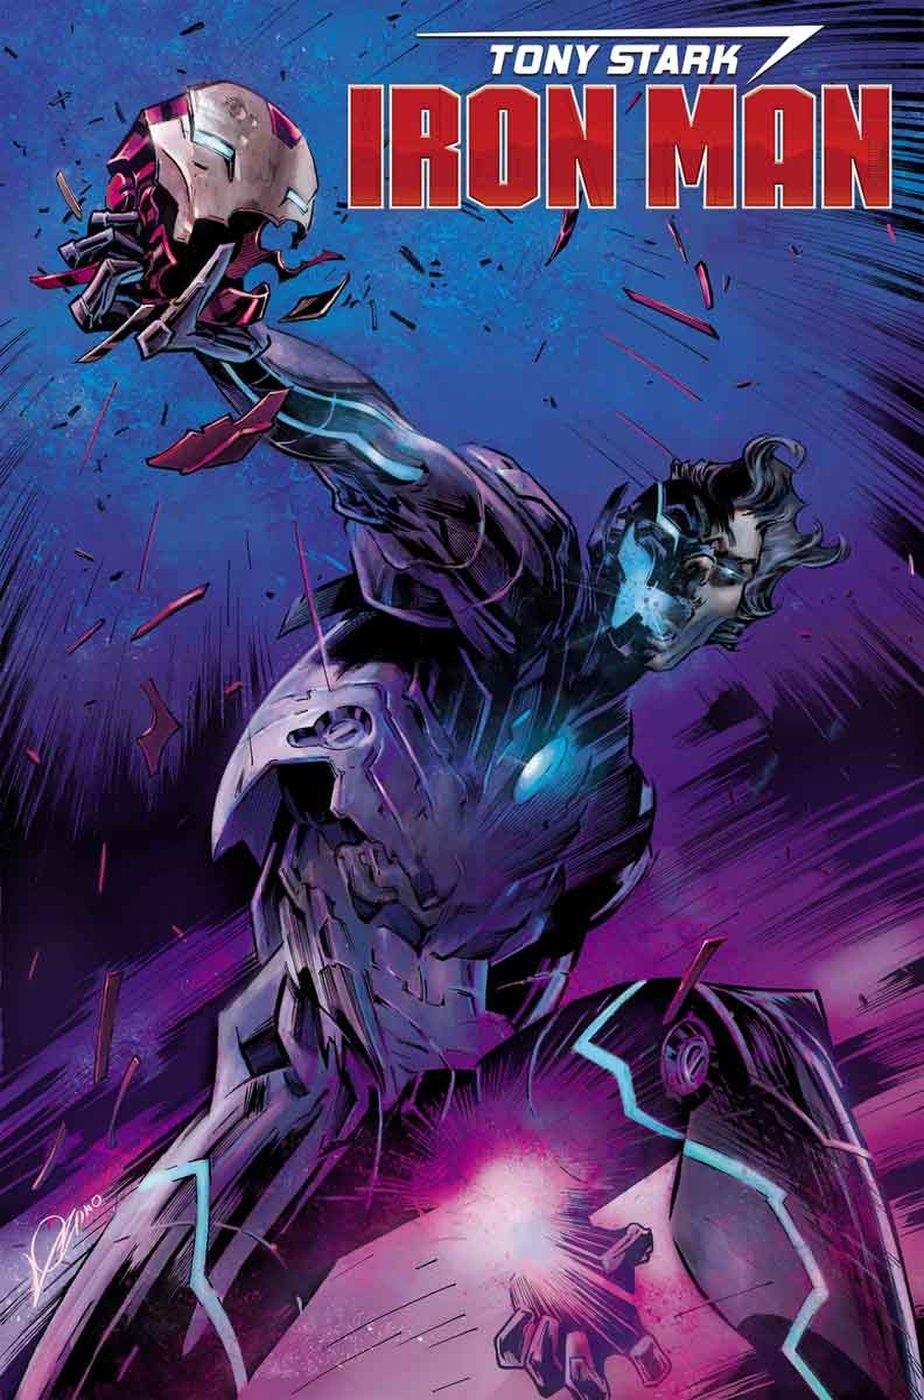 Marvel тизерит возвращение гибрида Хэнка Пима иАльтрона [обновлено]